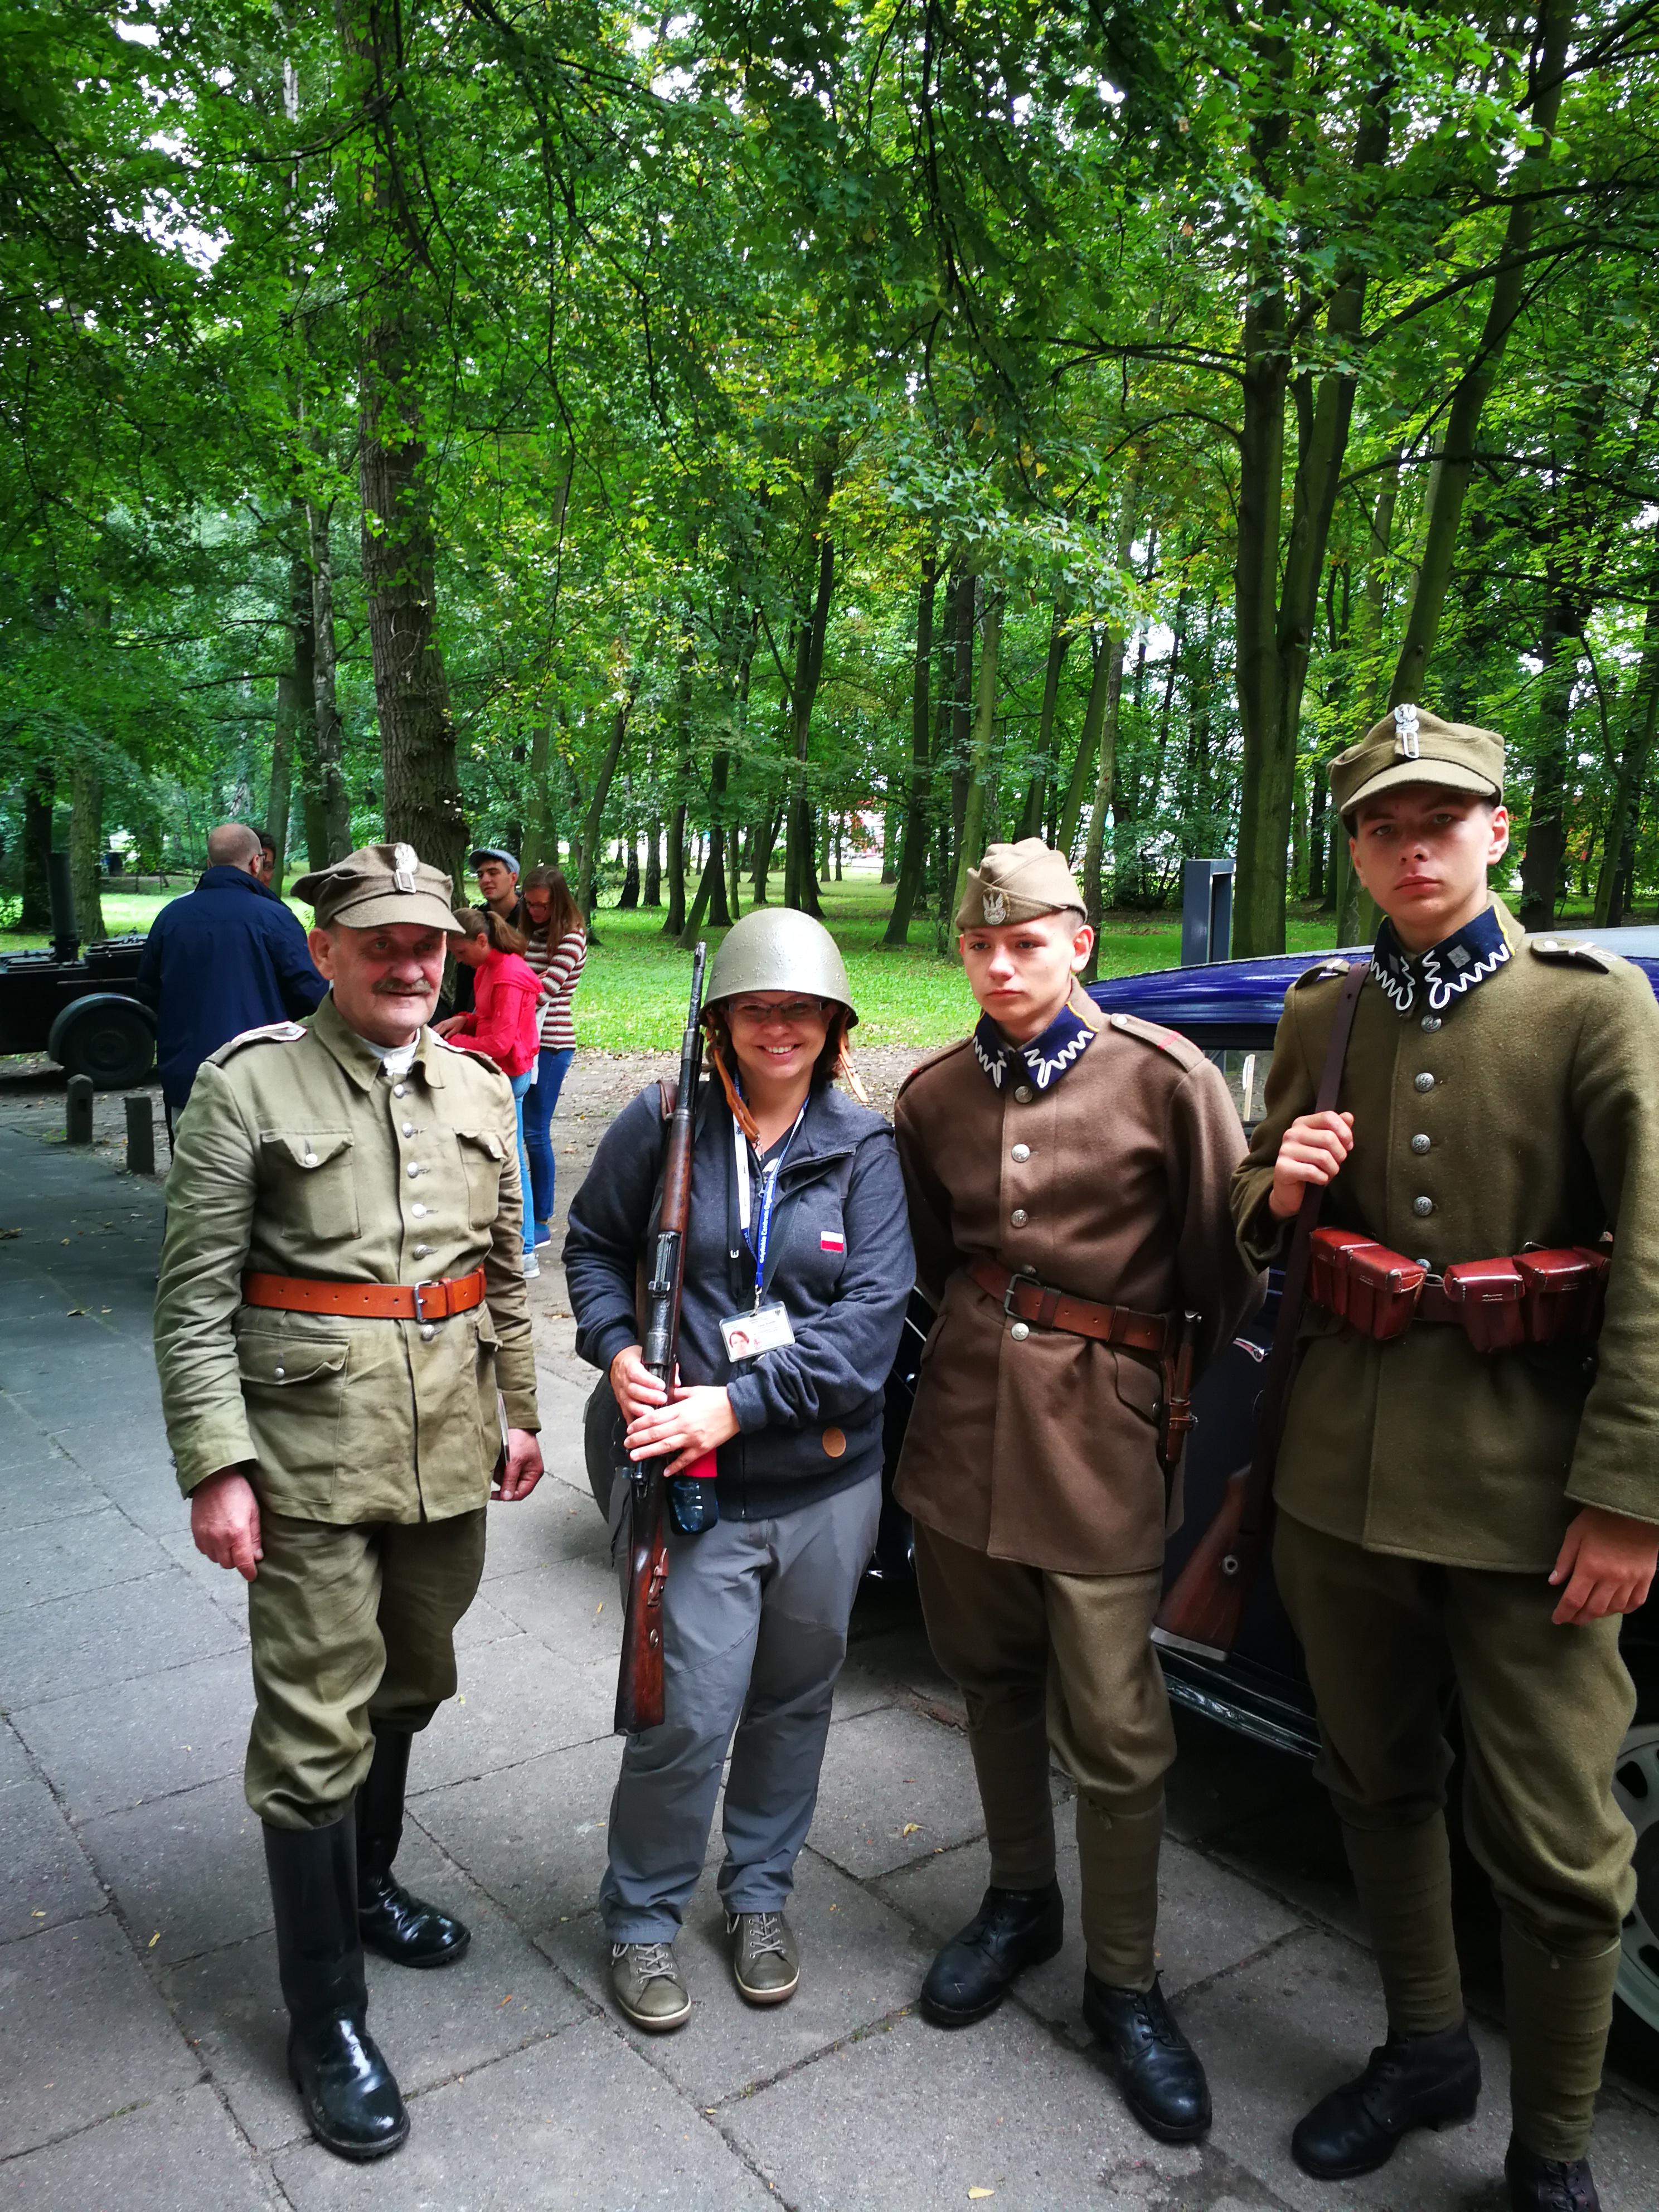 Westerplatte, Foto Ania Anna Kotula de Tour Guide Service Gdansk